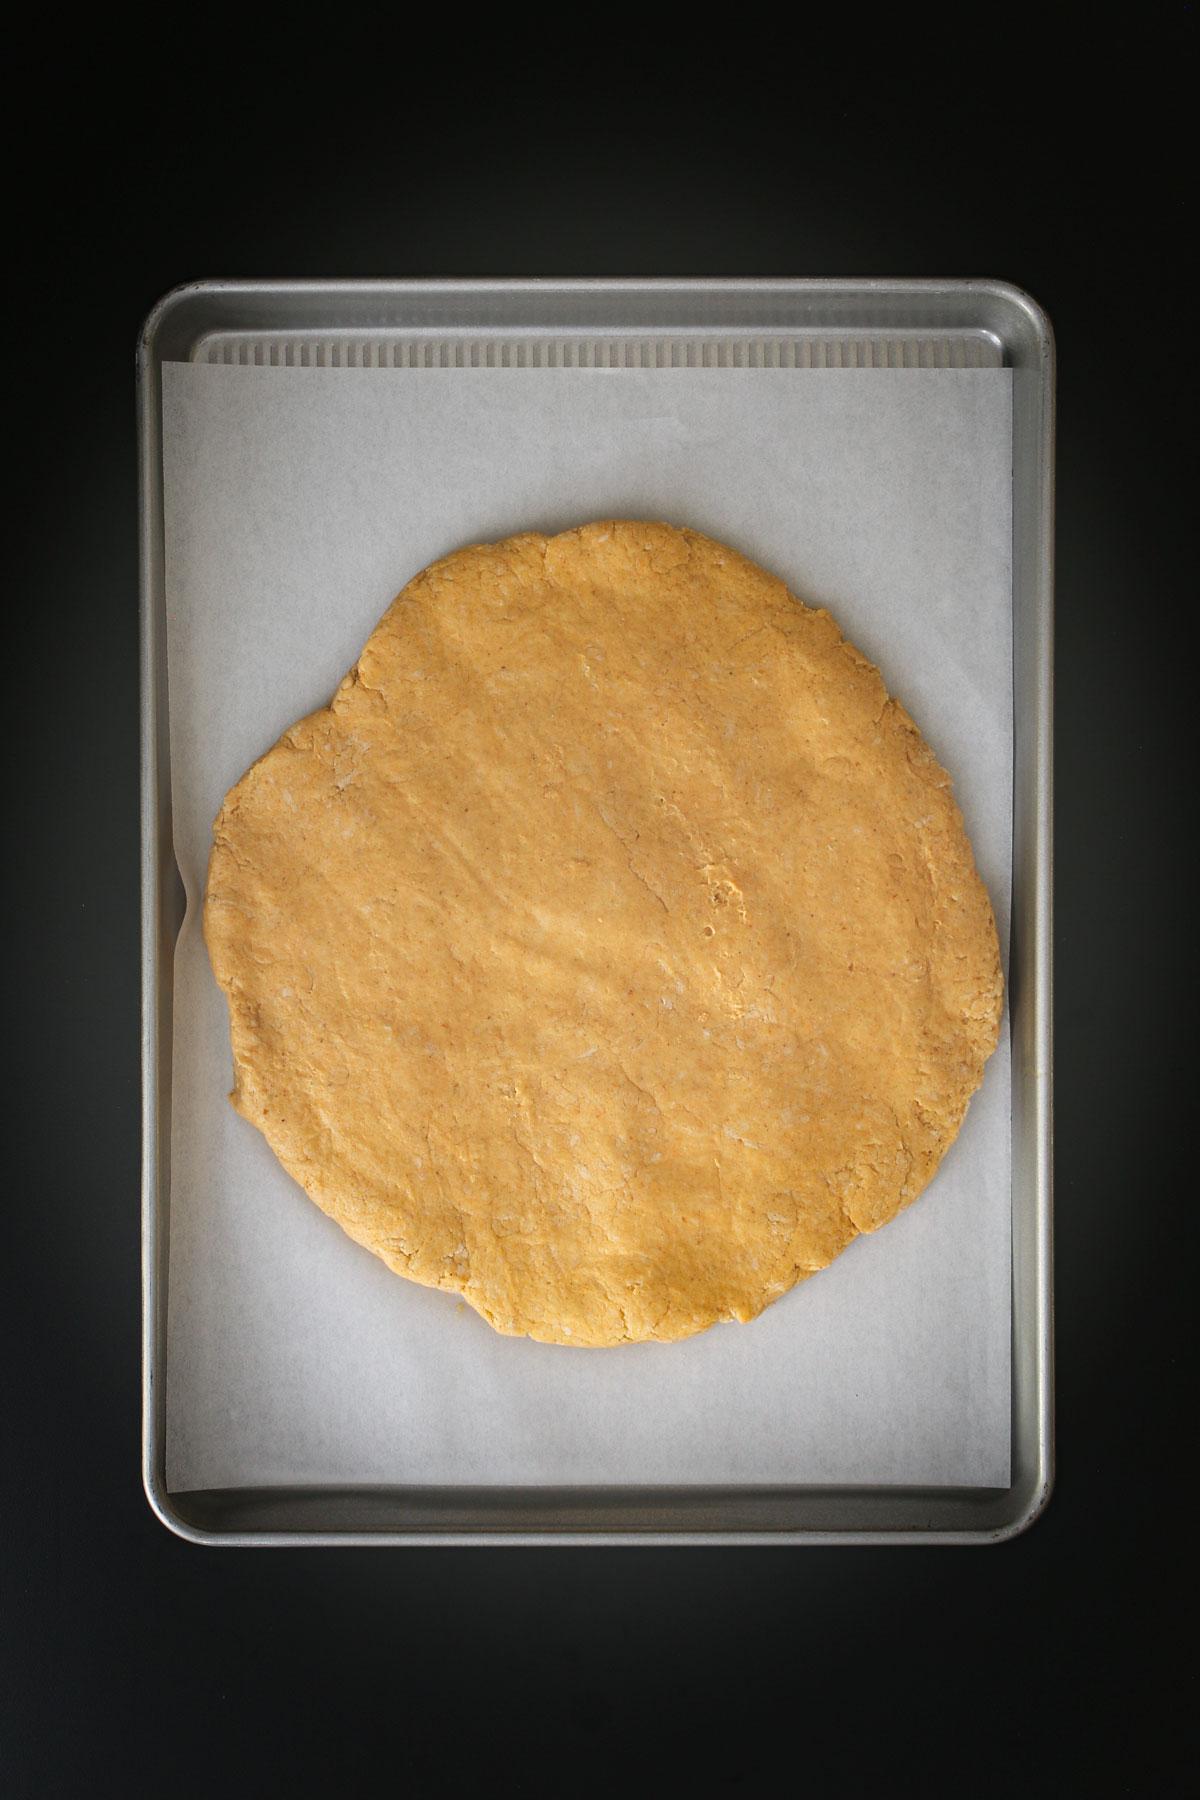 dough pat out into large circle on baking sheet.